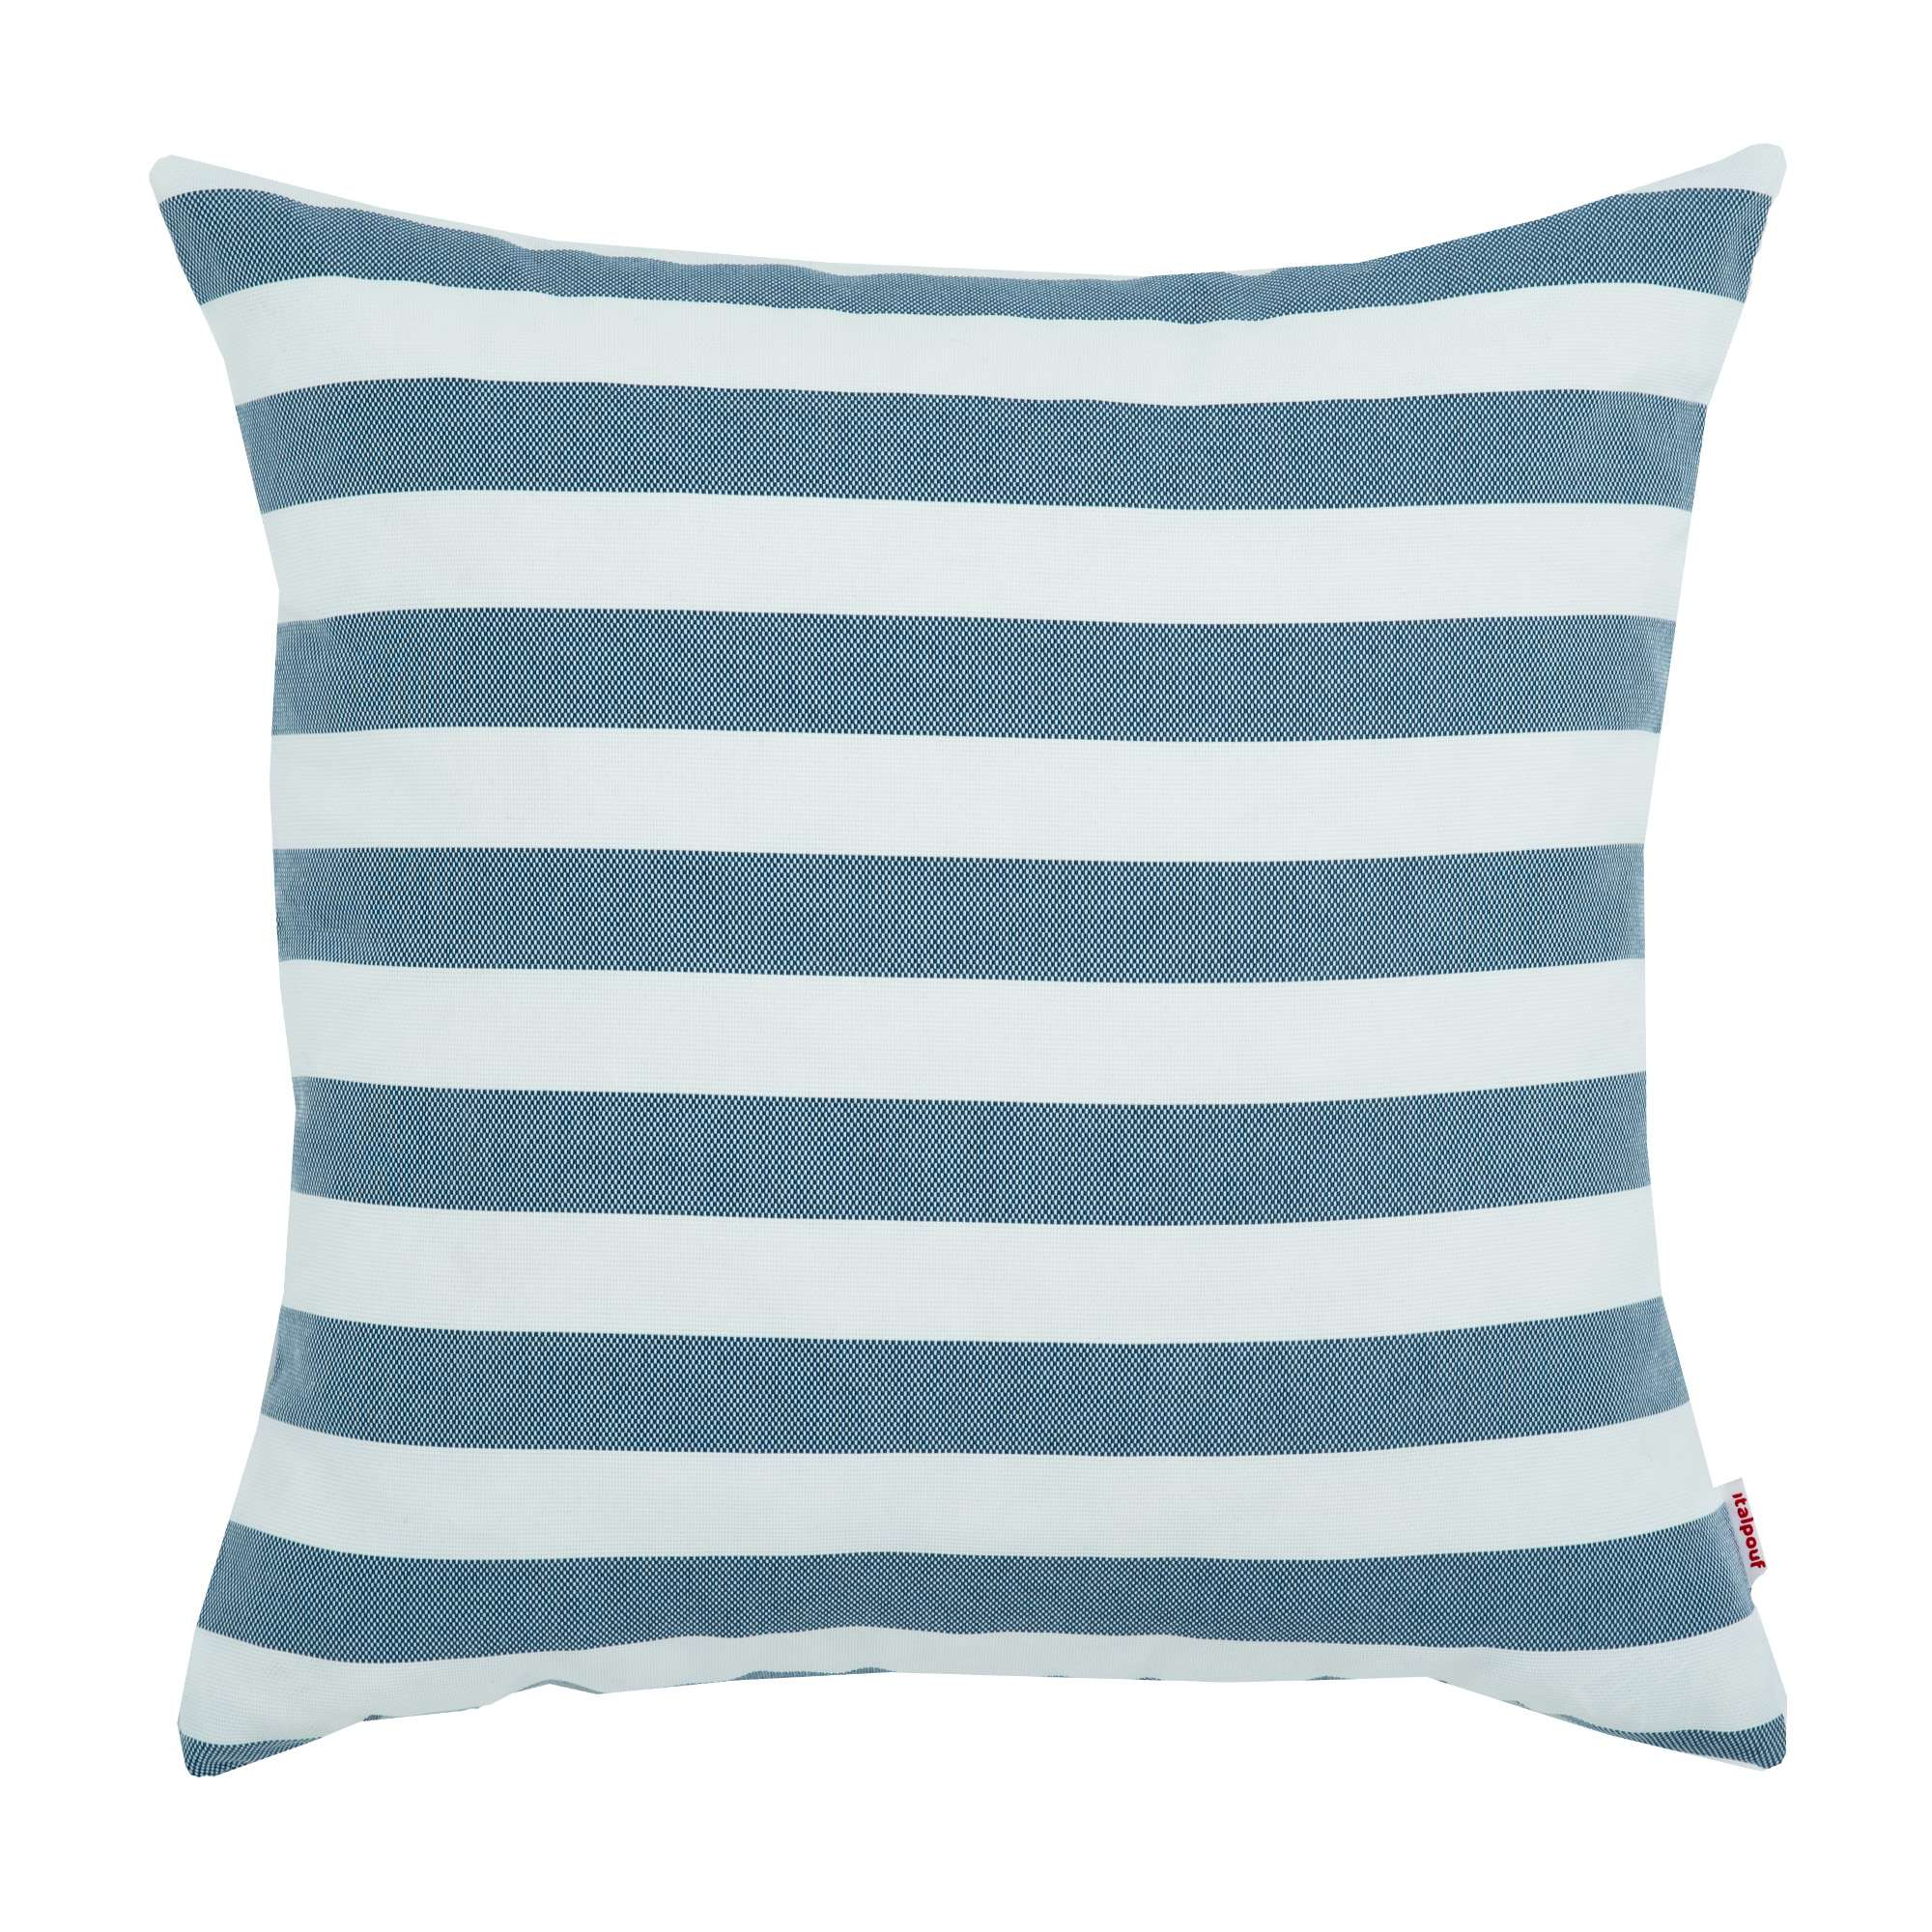 Cuscini Da Esterno Impermeabili cuscino impermeabile da esterno. cuscino da giardino strisce moderno